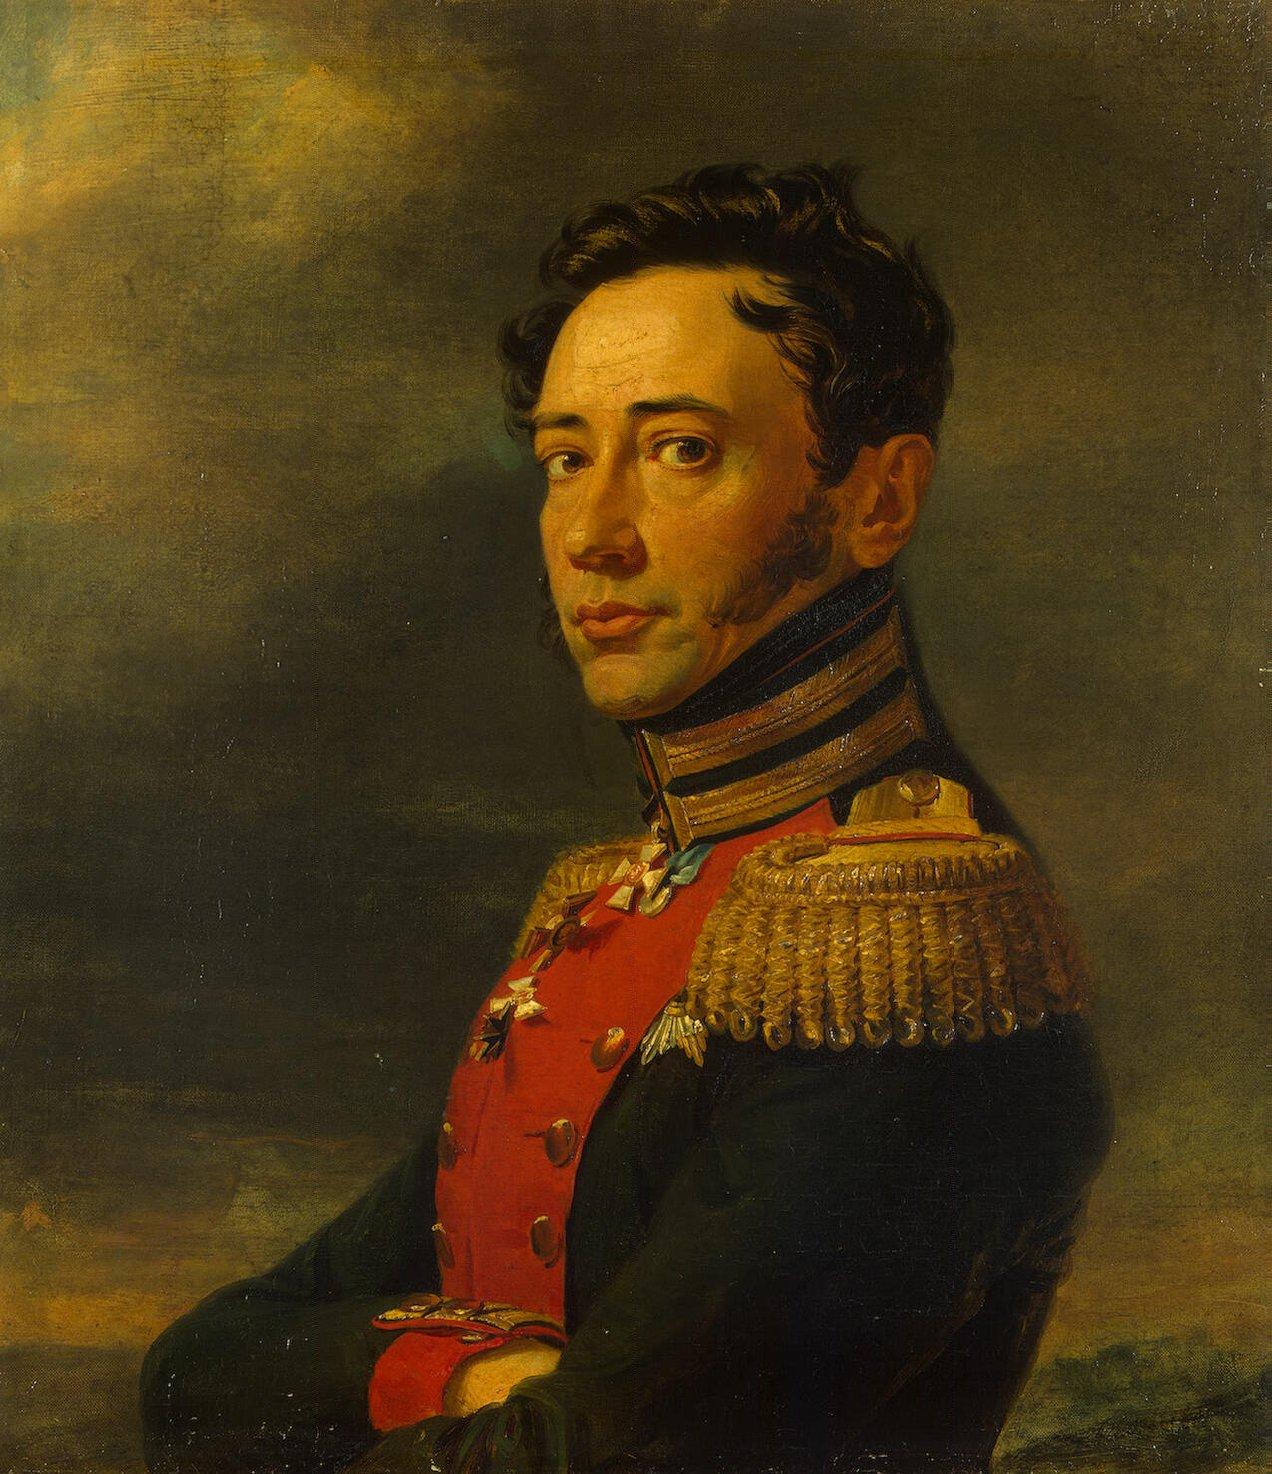 Желтухин, Пётр Фёдорович